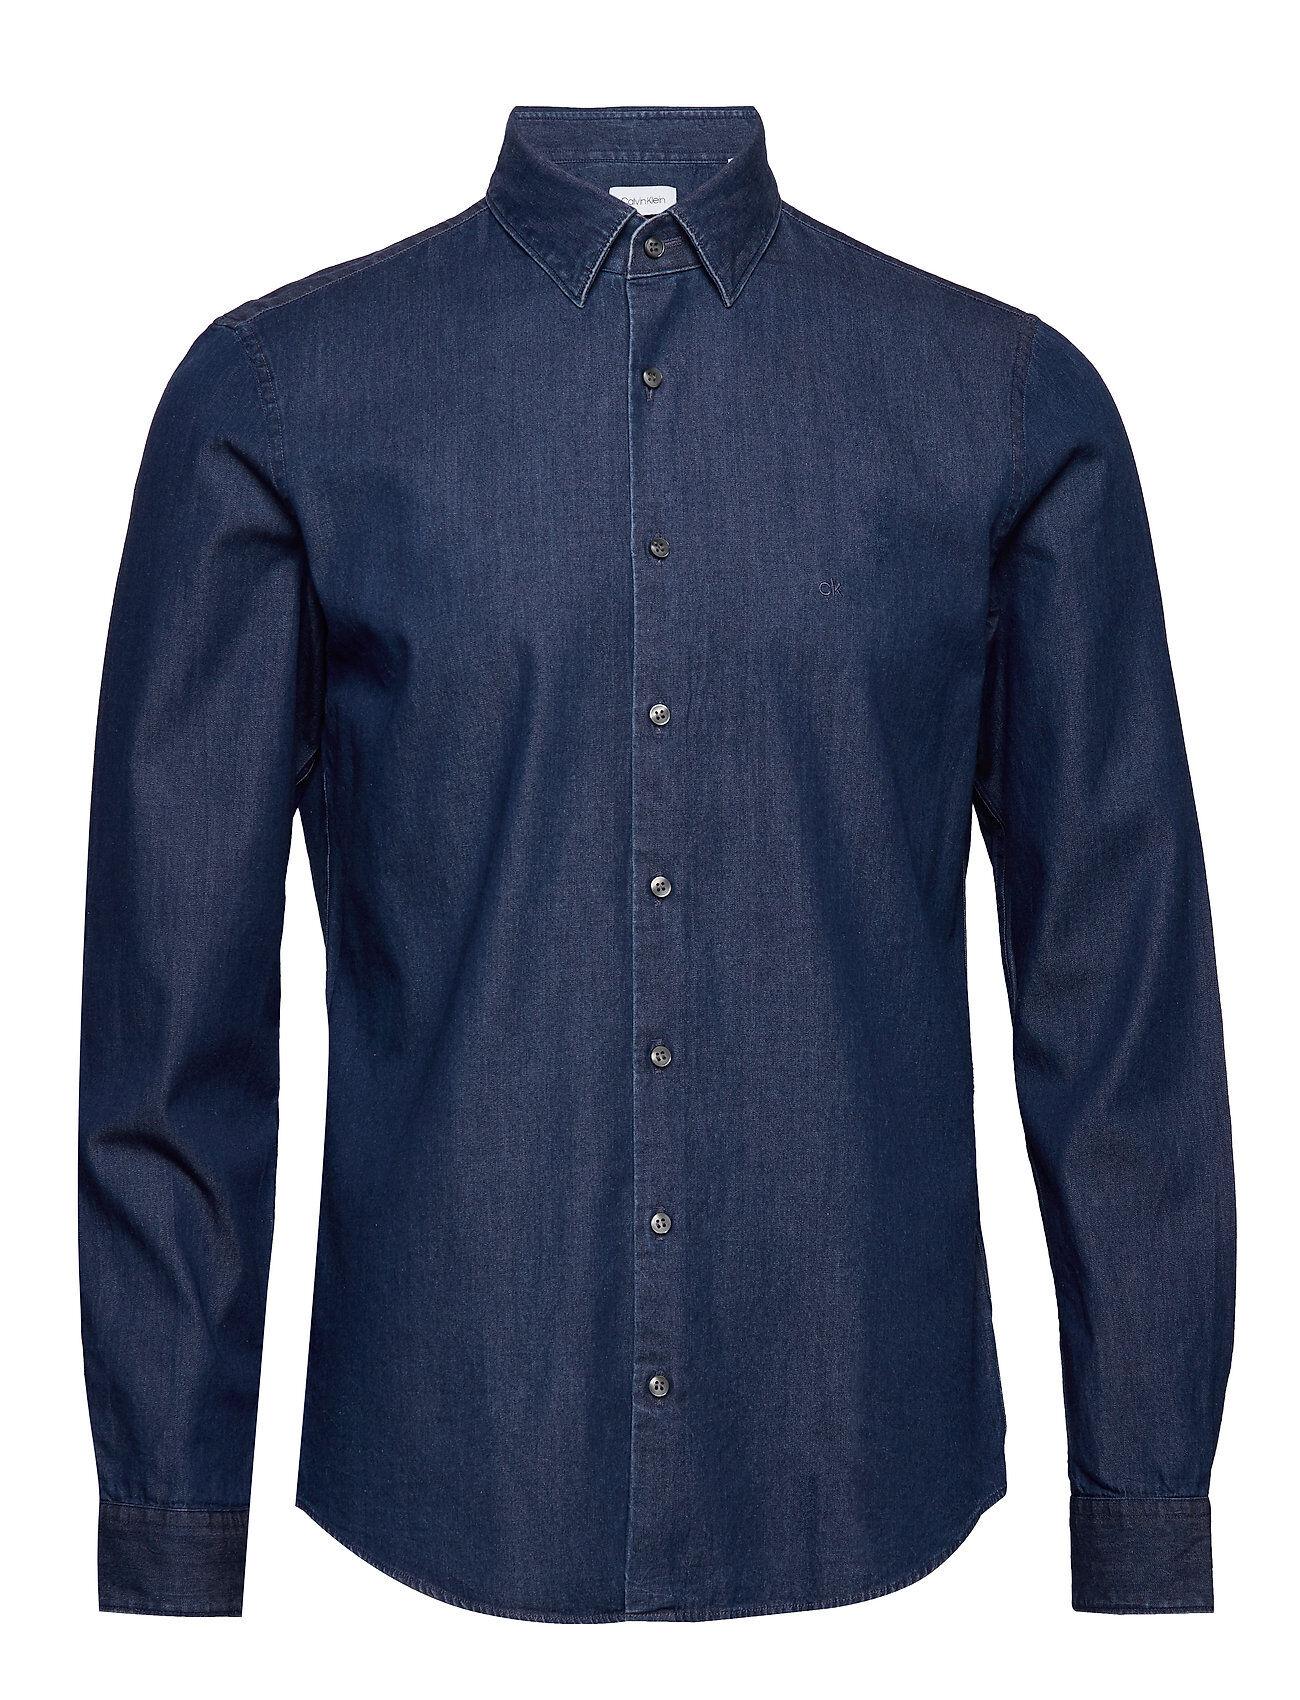 Image of Calvin Denim Washed Slim Shirt Paita Rento Casual Sininen Calvin Klein